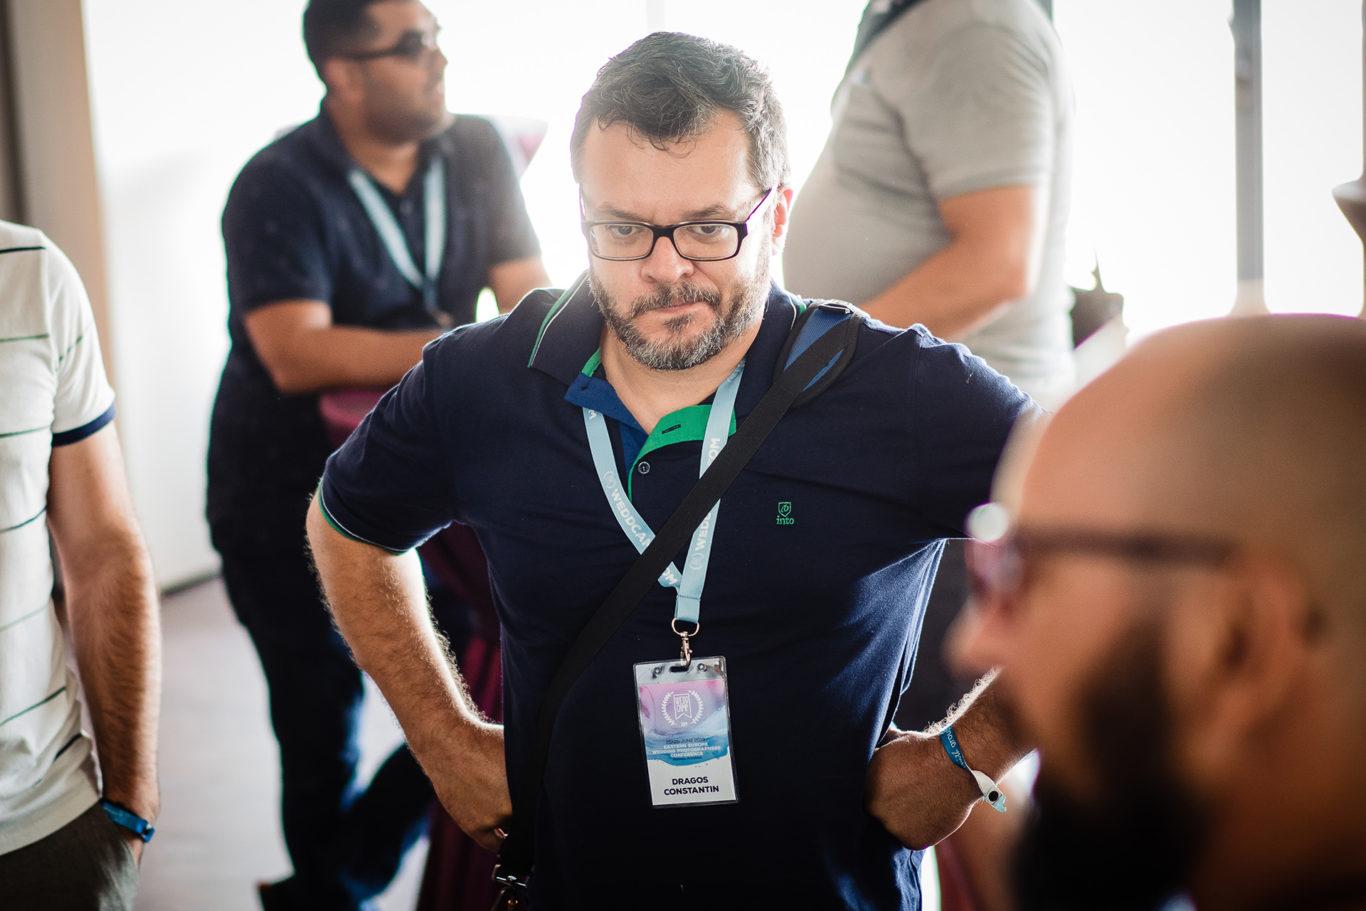 Dragos Constantin @ Weddcamp